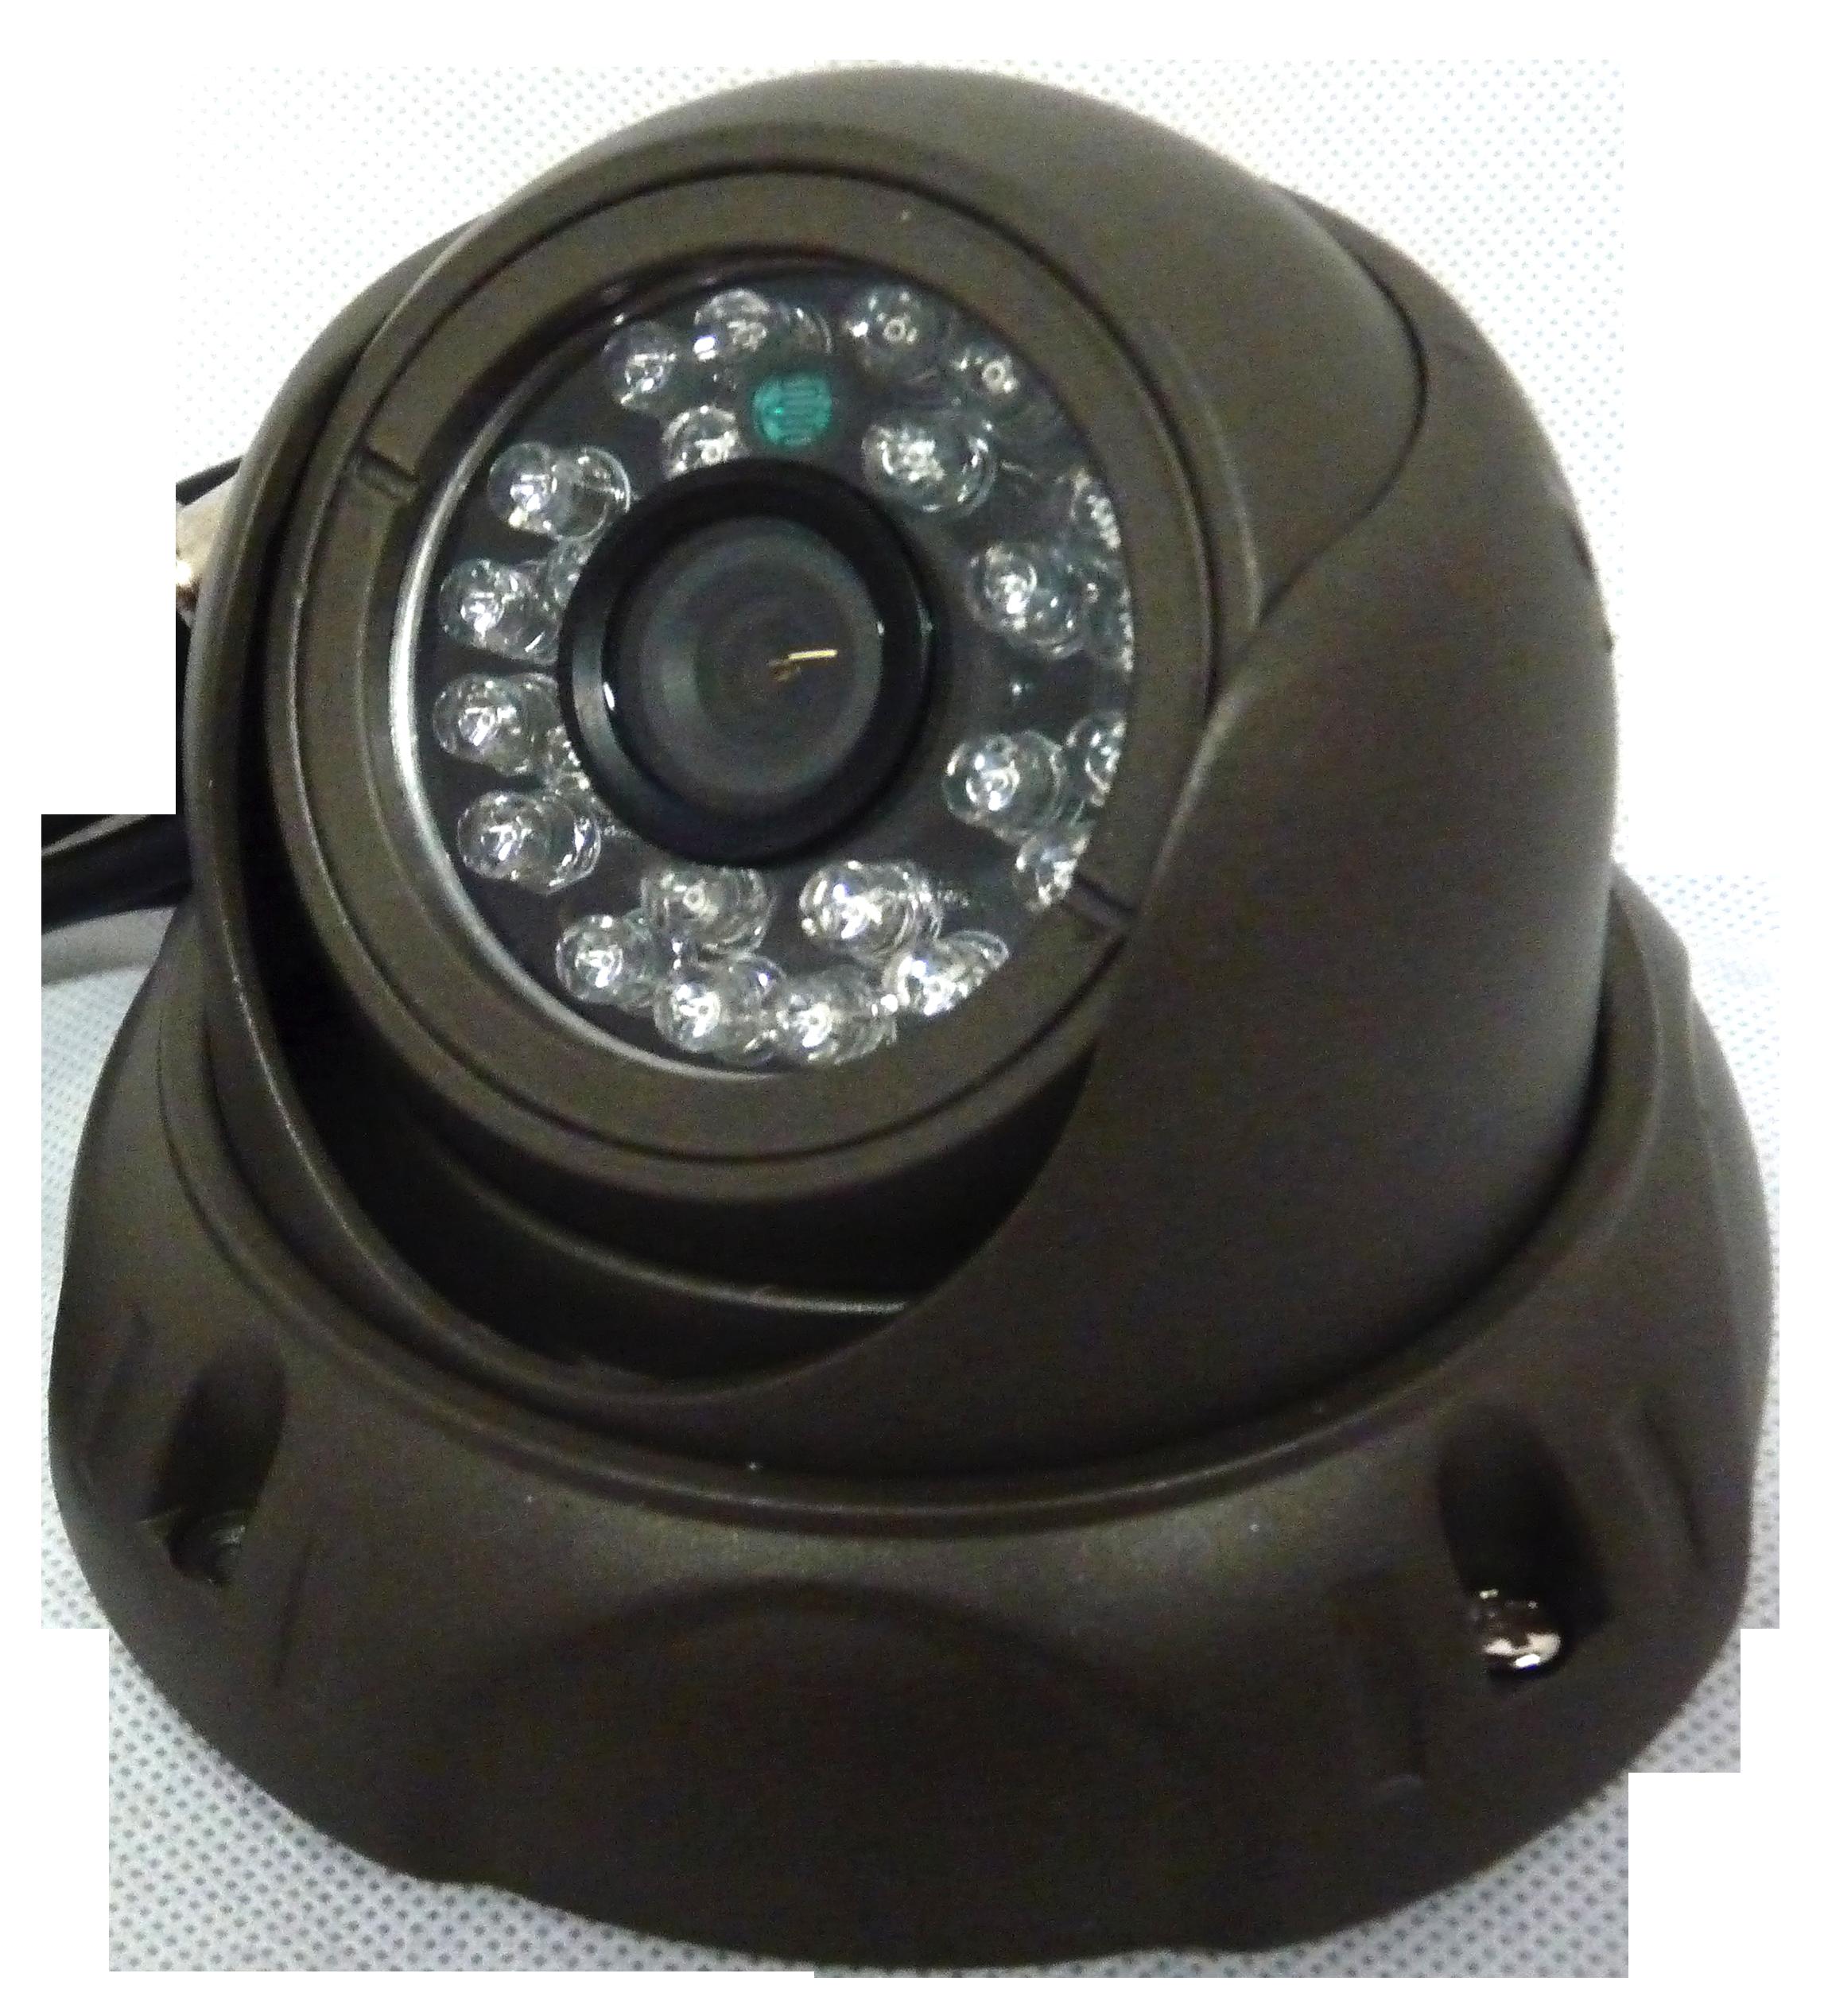 DBS 785G - 700TVL CCTV Dome Security Camera - 1/3'' Sony Super HAD CCD II